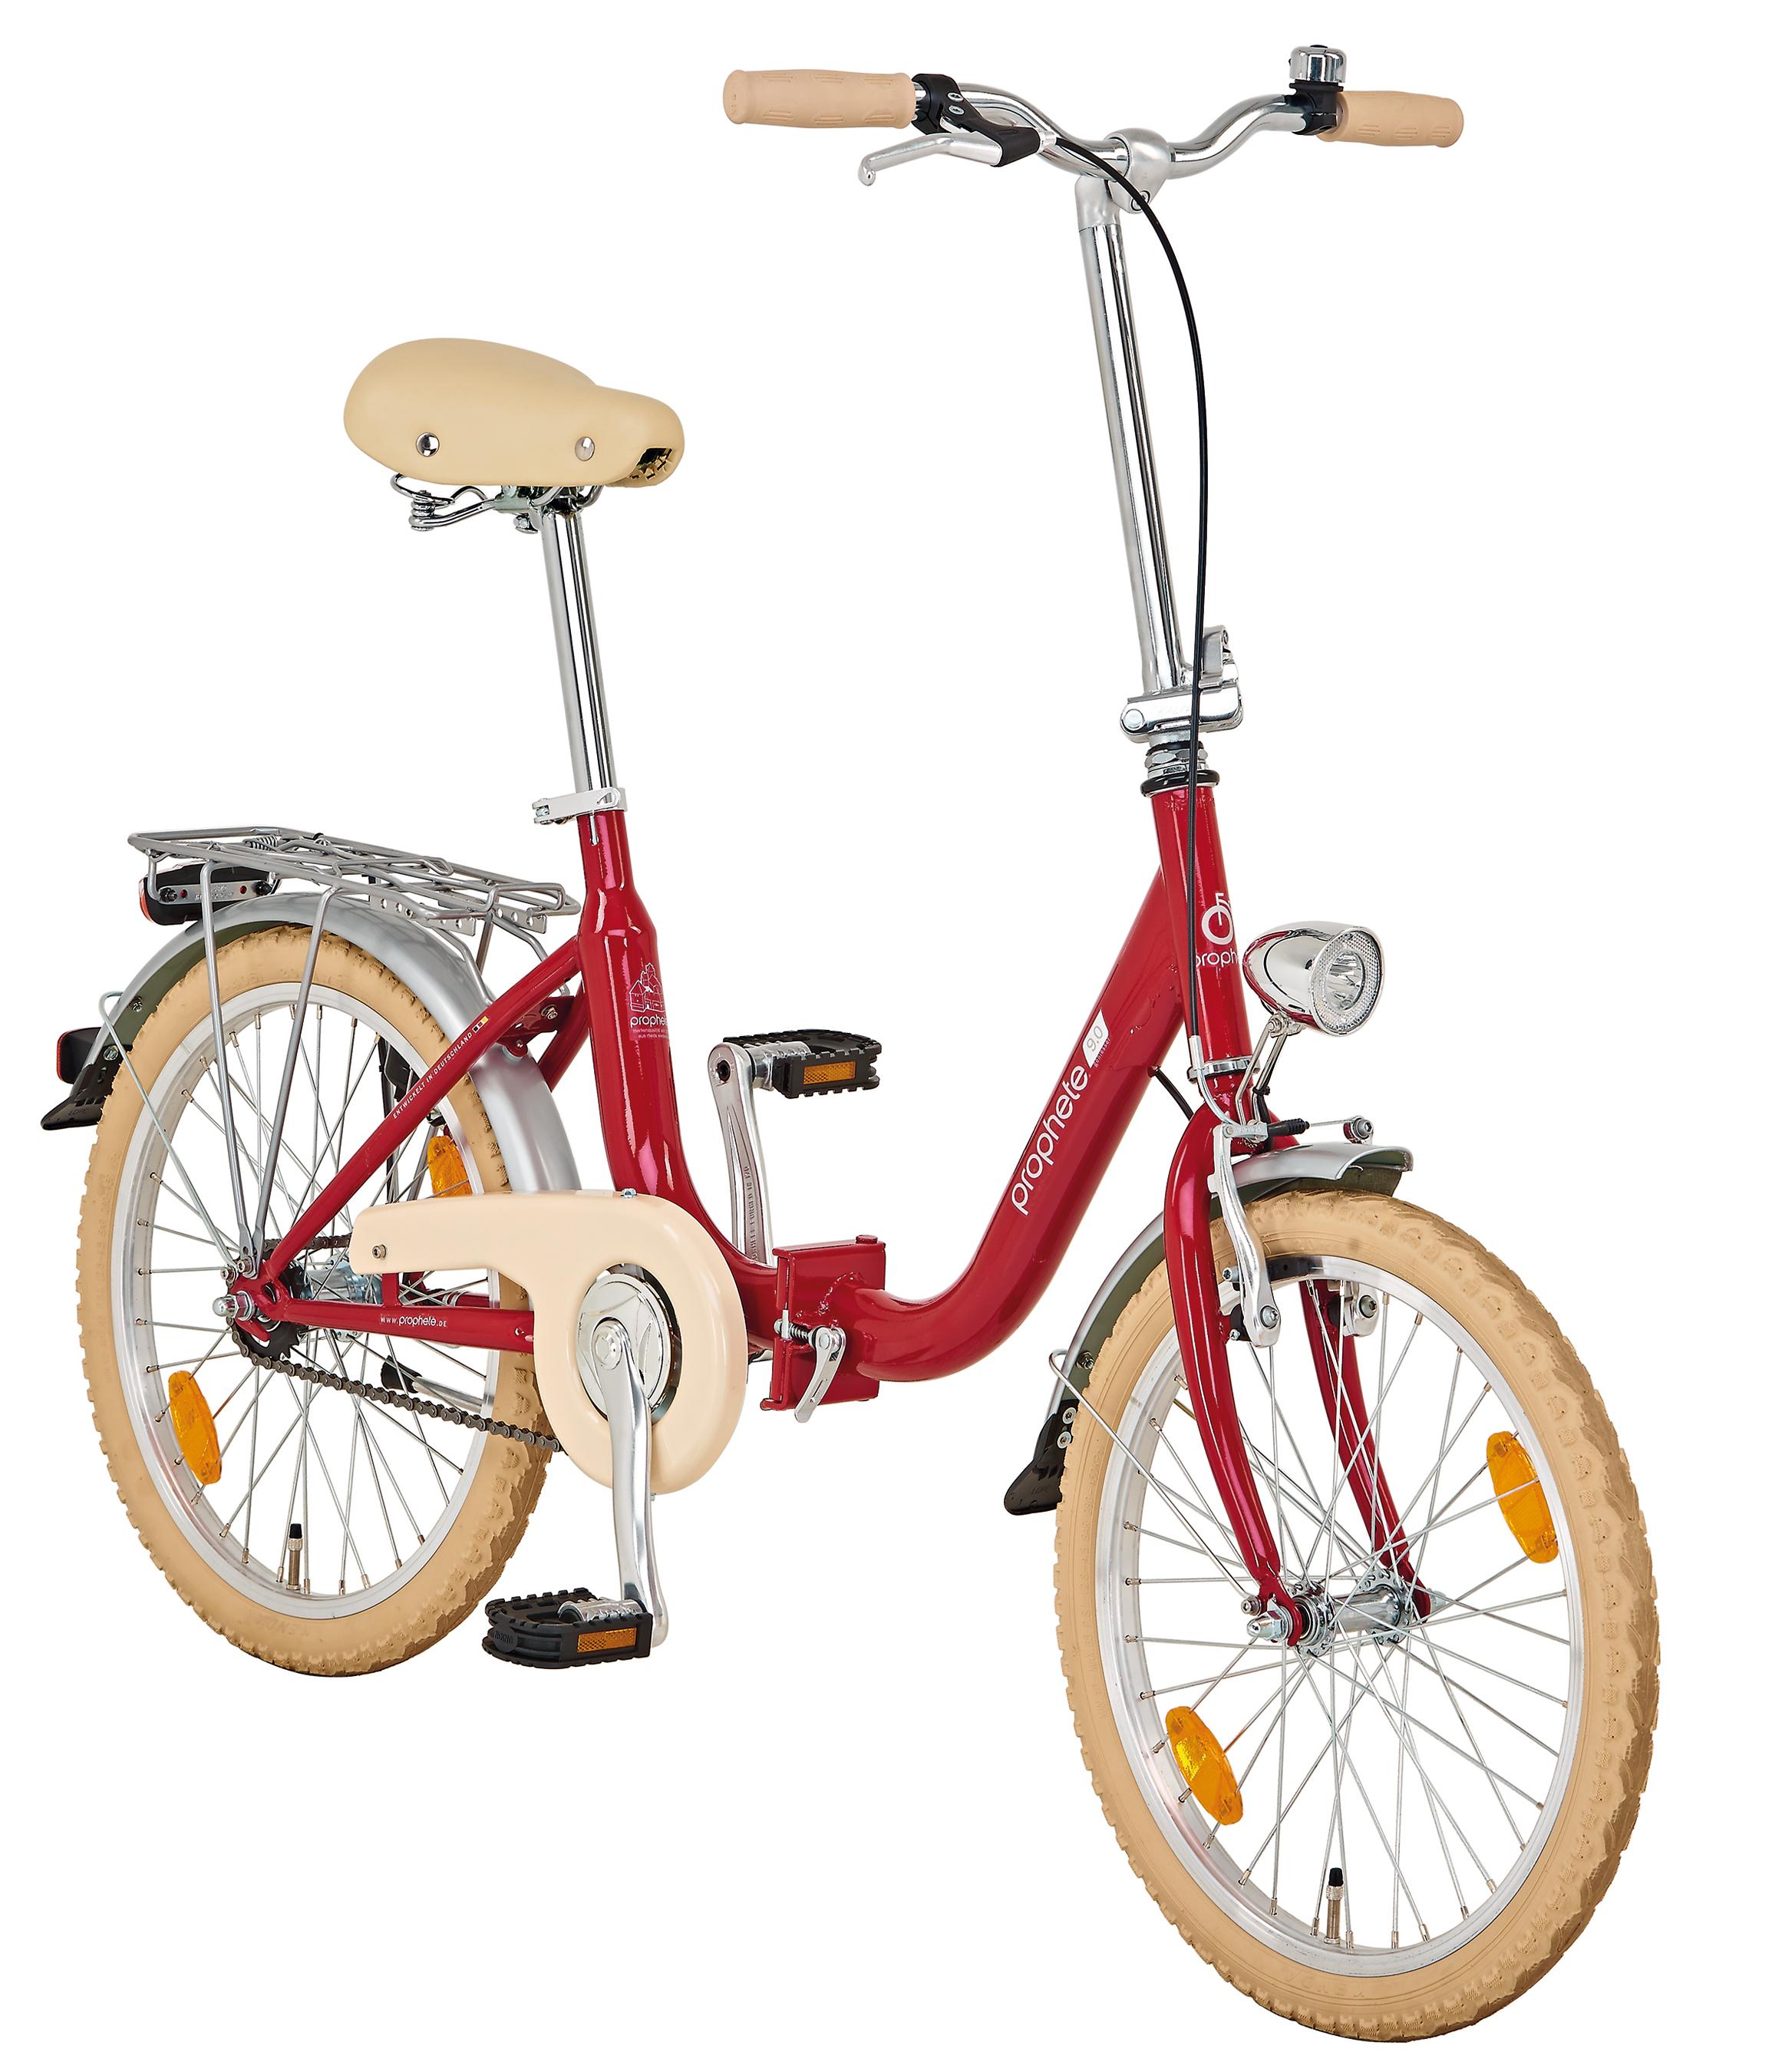 "Prophete City Faltrad Geniesser 9.0 City Bike 20"" Bild 2"